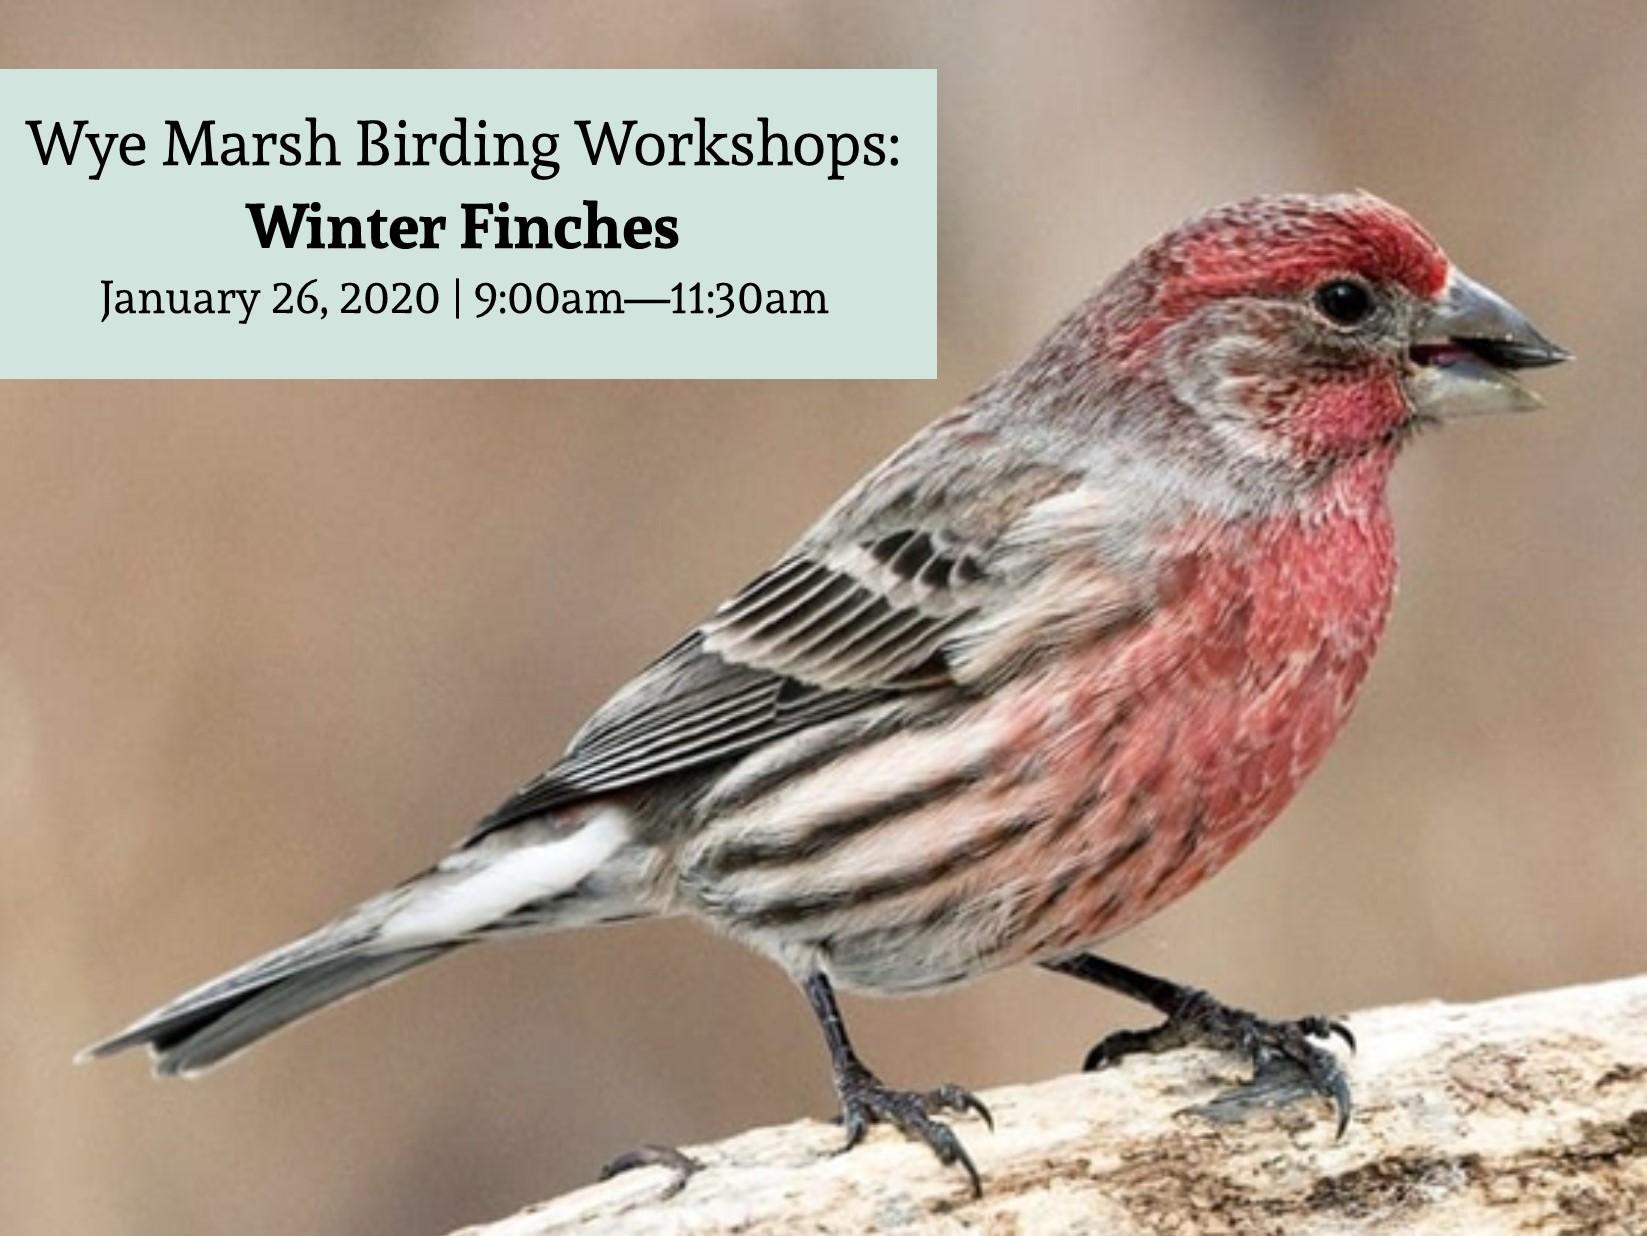 Winter Finches - WINTER FINCHES BIRDING WORKSHOP